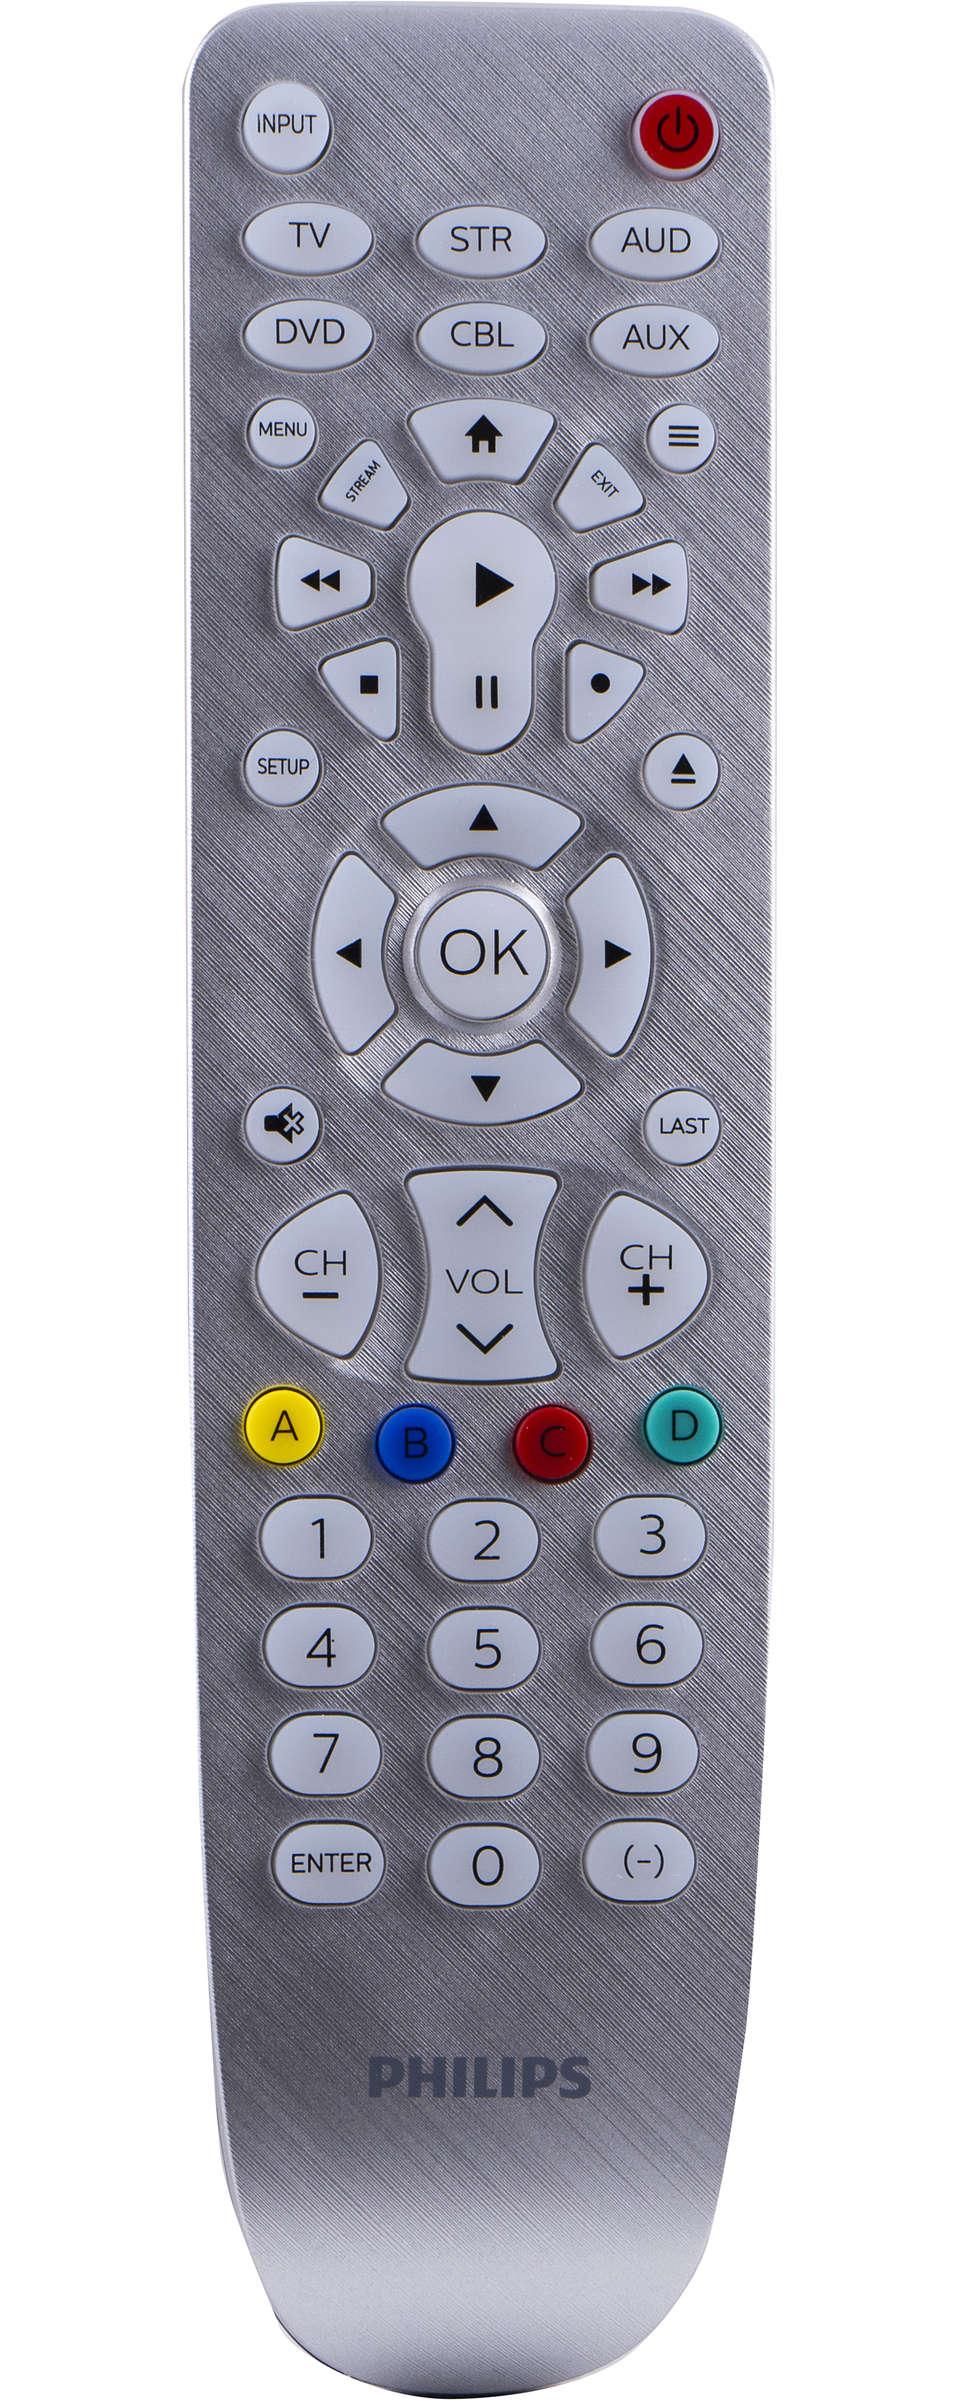 6 Device Universal Remote Control, Backlit